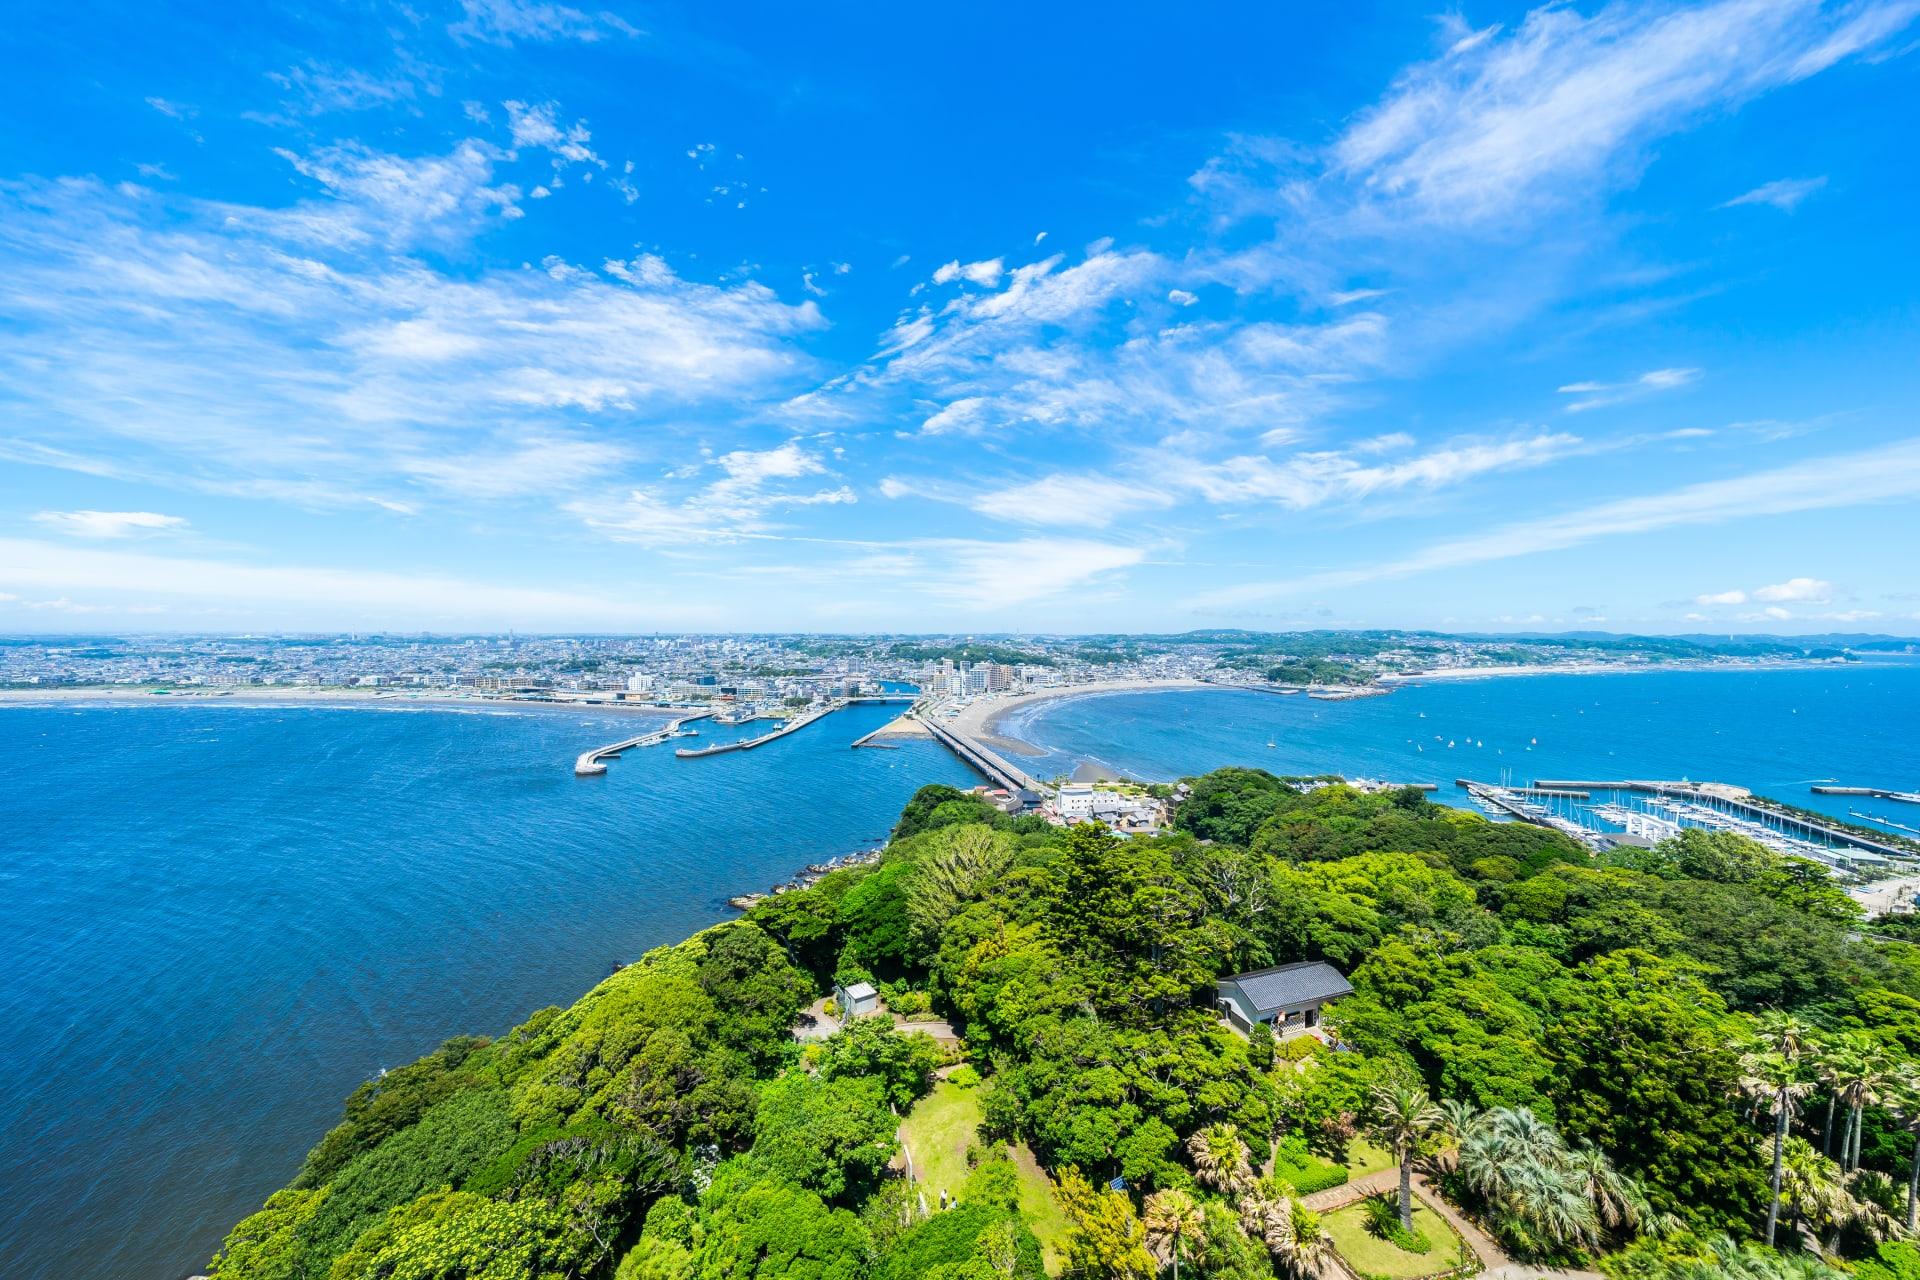 Kanagawa - The Sacred Island of Enoshima - Part 2